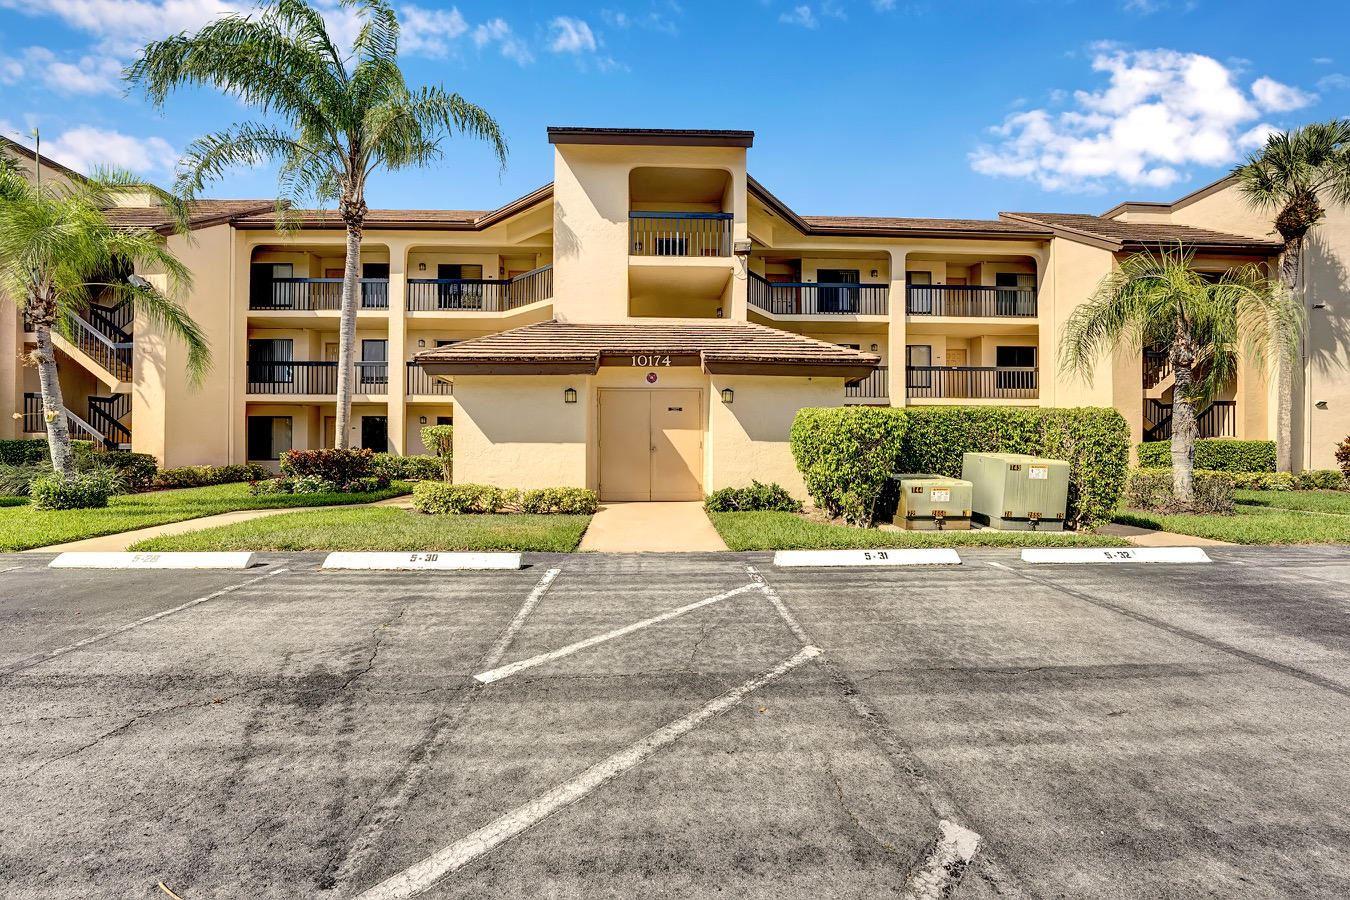 10174 Mangrove Drive #105, Boynton Beach, FL 33437 - MLS#: RX-10713164